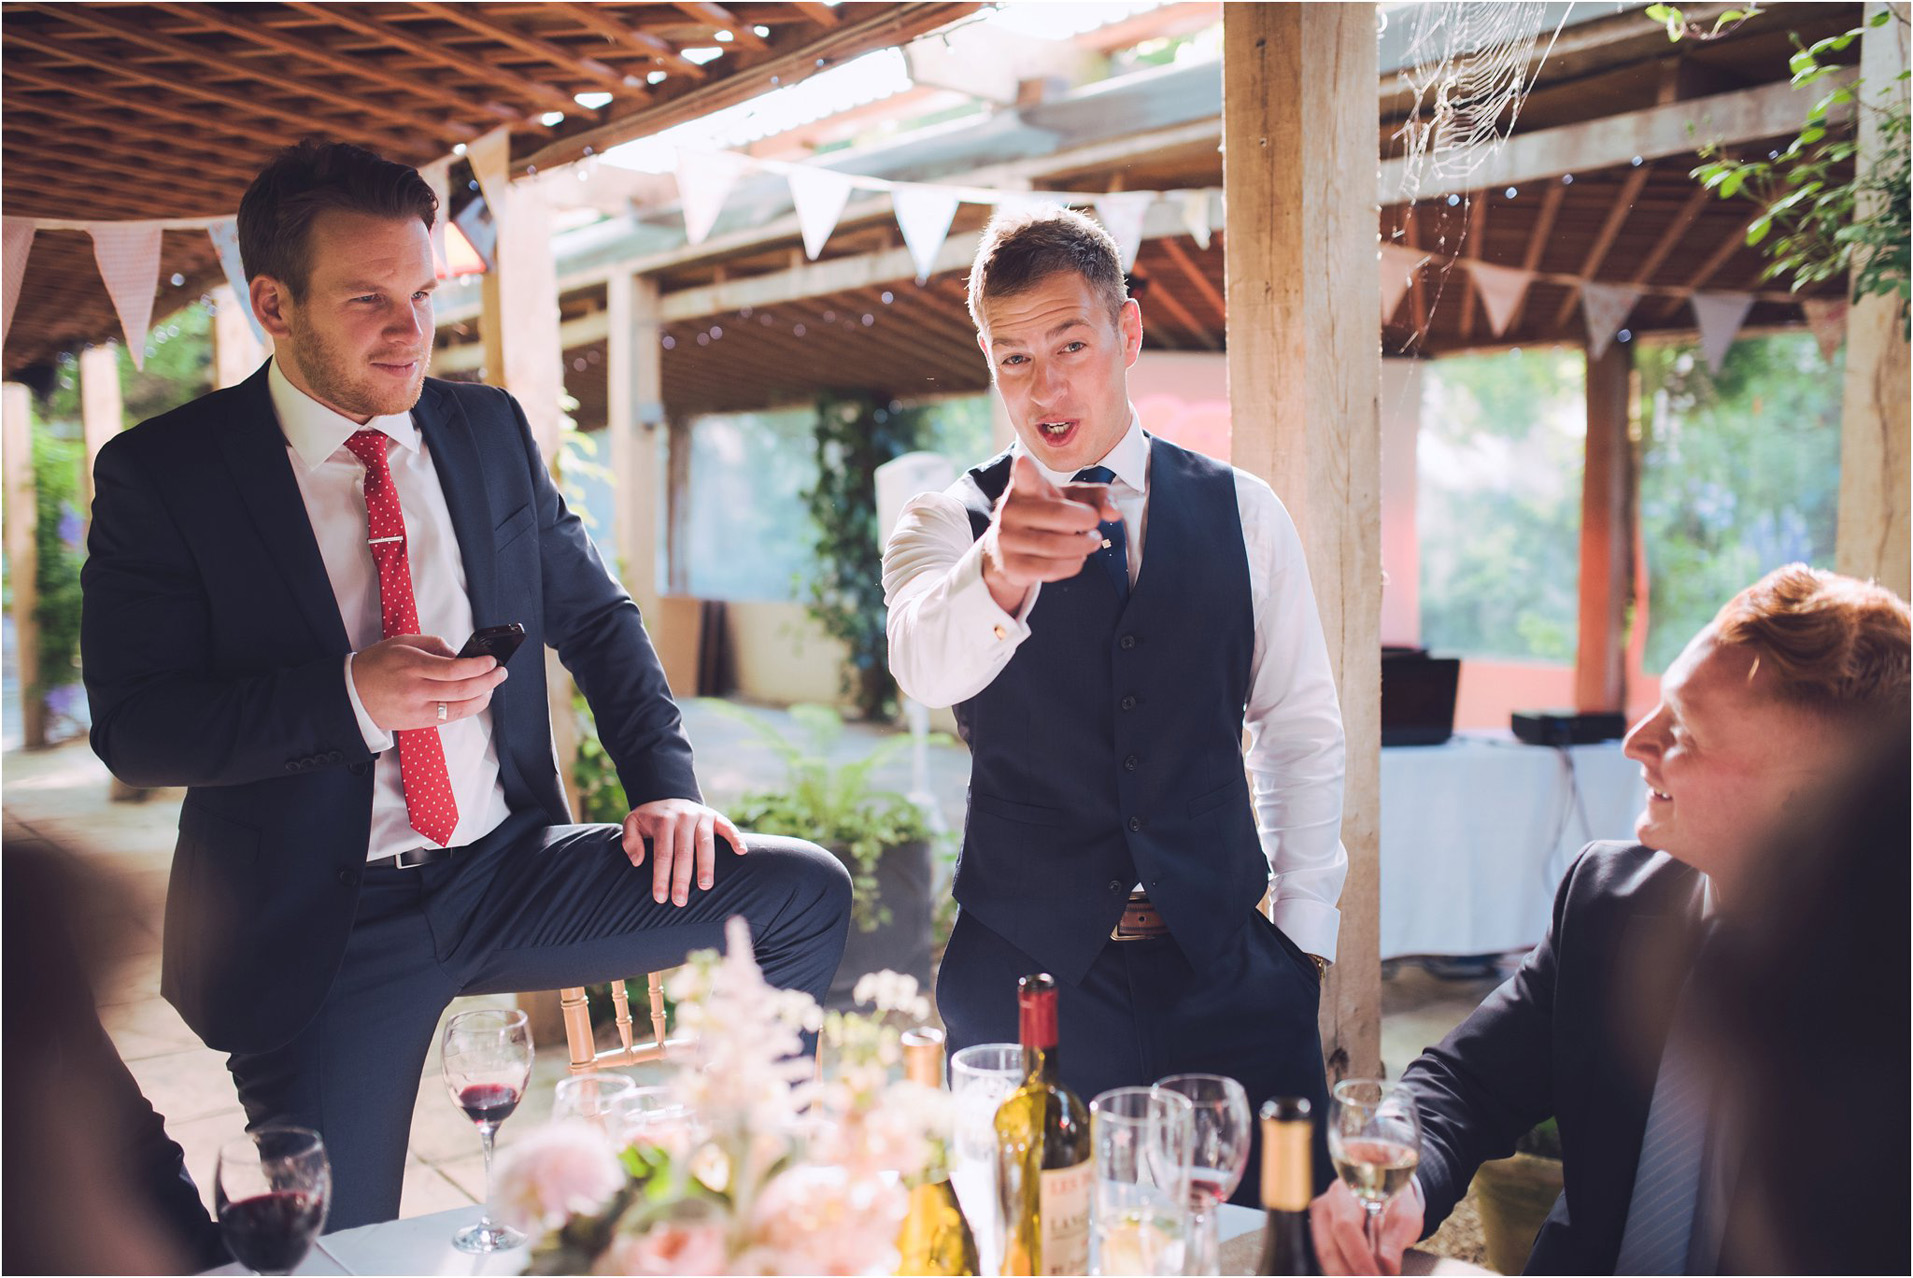 Simon biffen wedding photography 0122